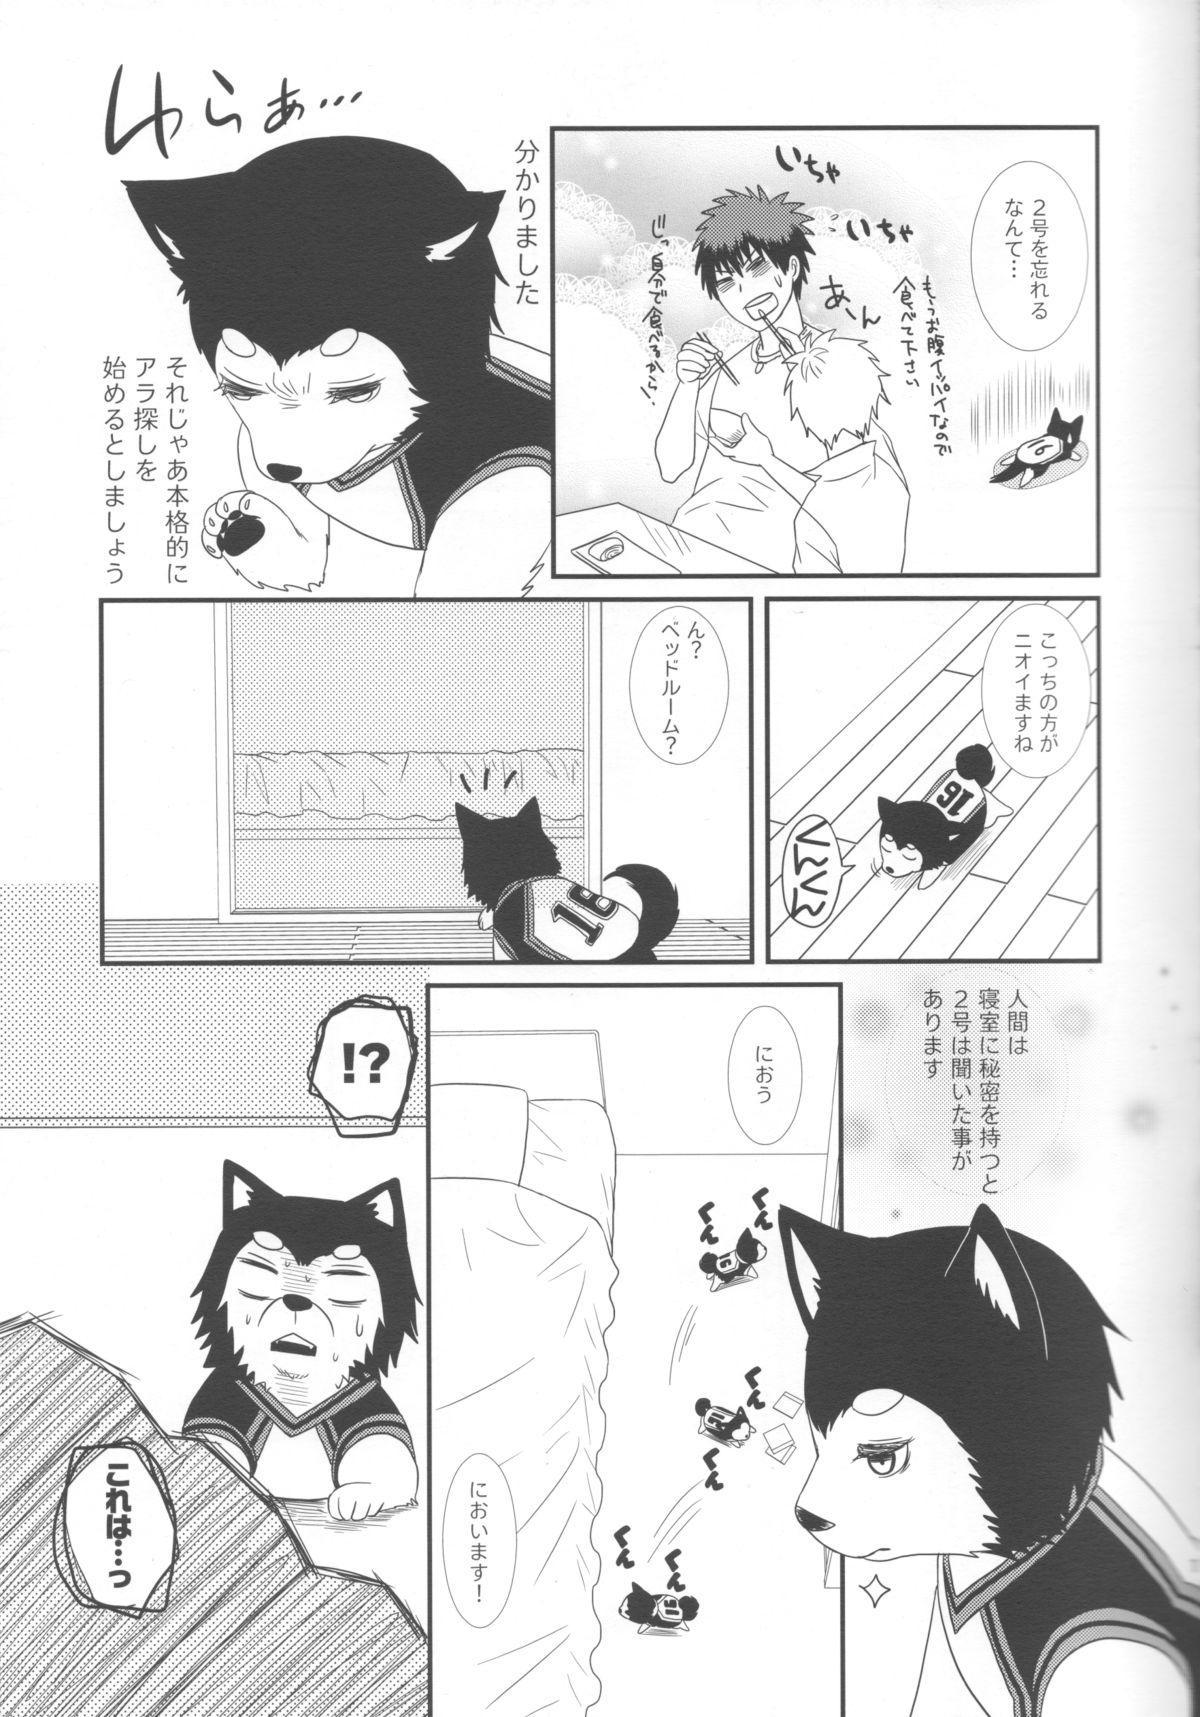 Kuroko to Kagami to Tokidoki Nigou to 9